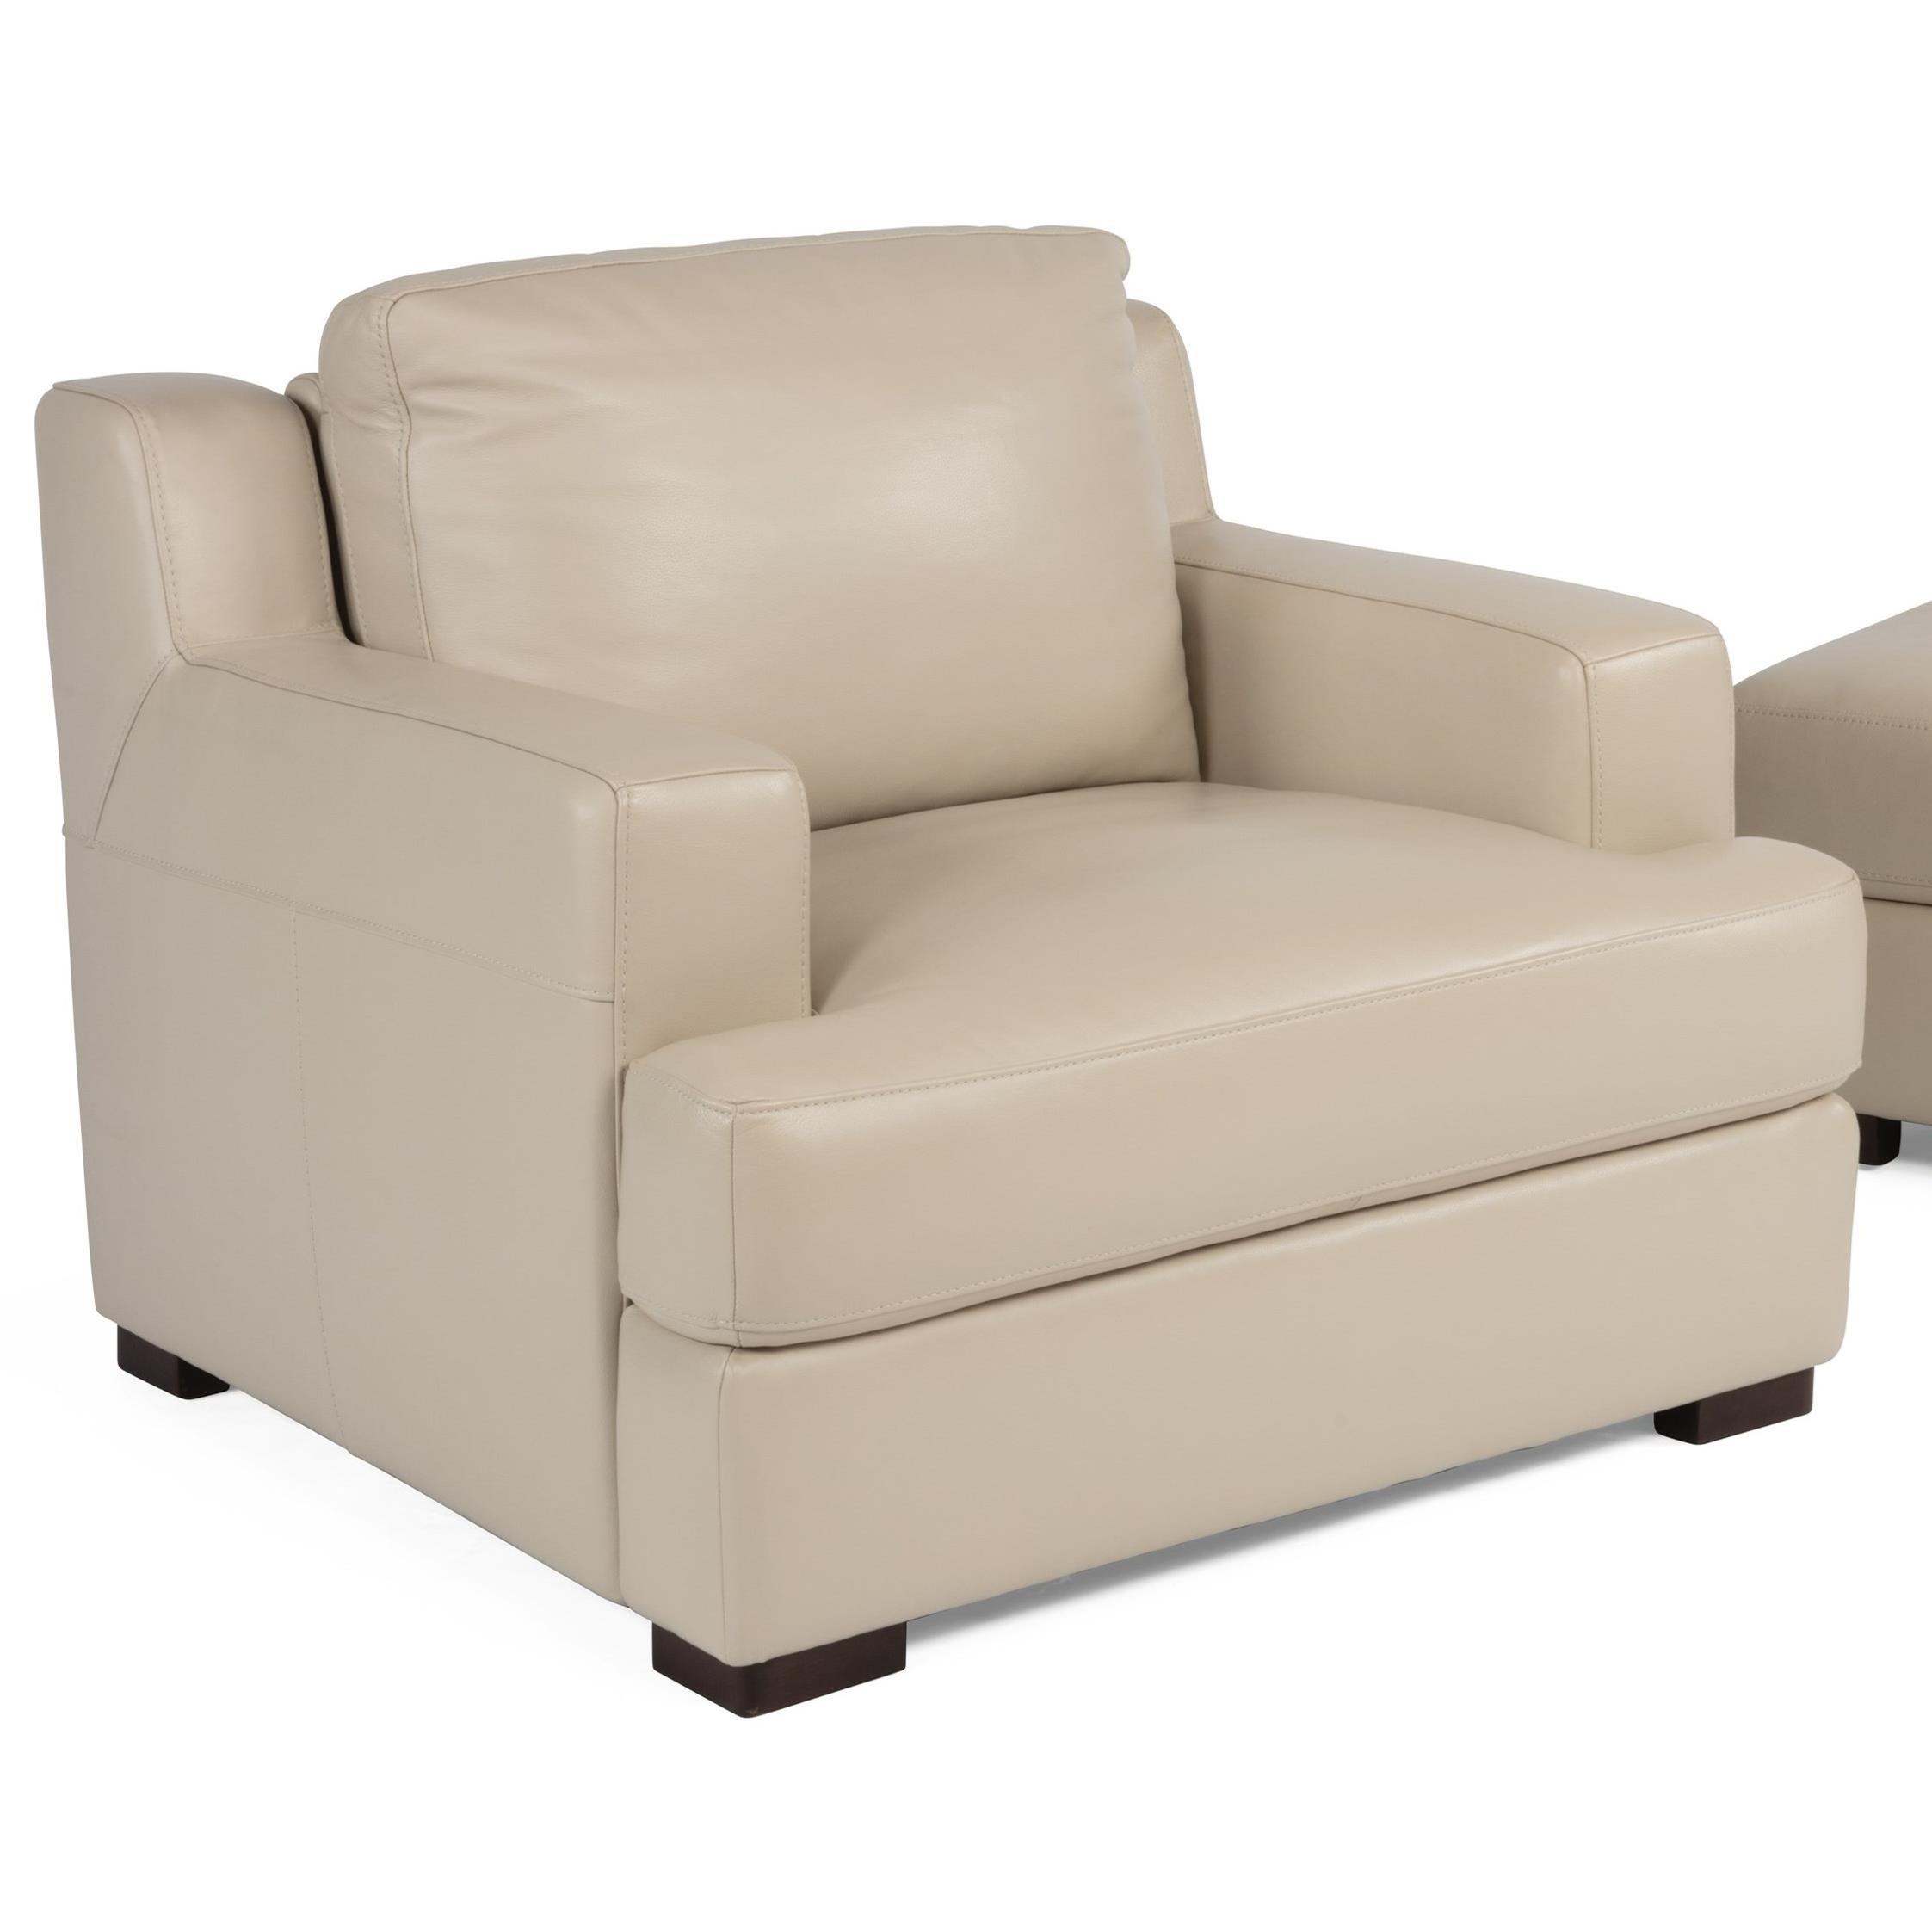 Latitudes- Dowd Power Adjustable Back Chair by Flexsteel at Walker's Furniture